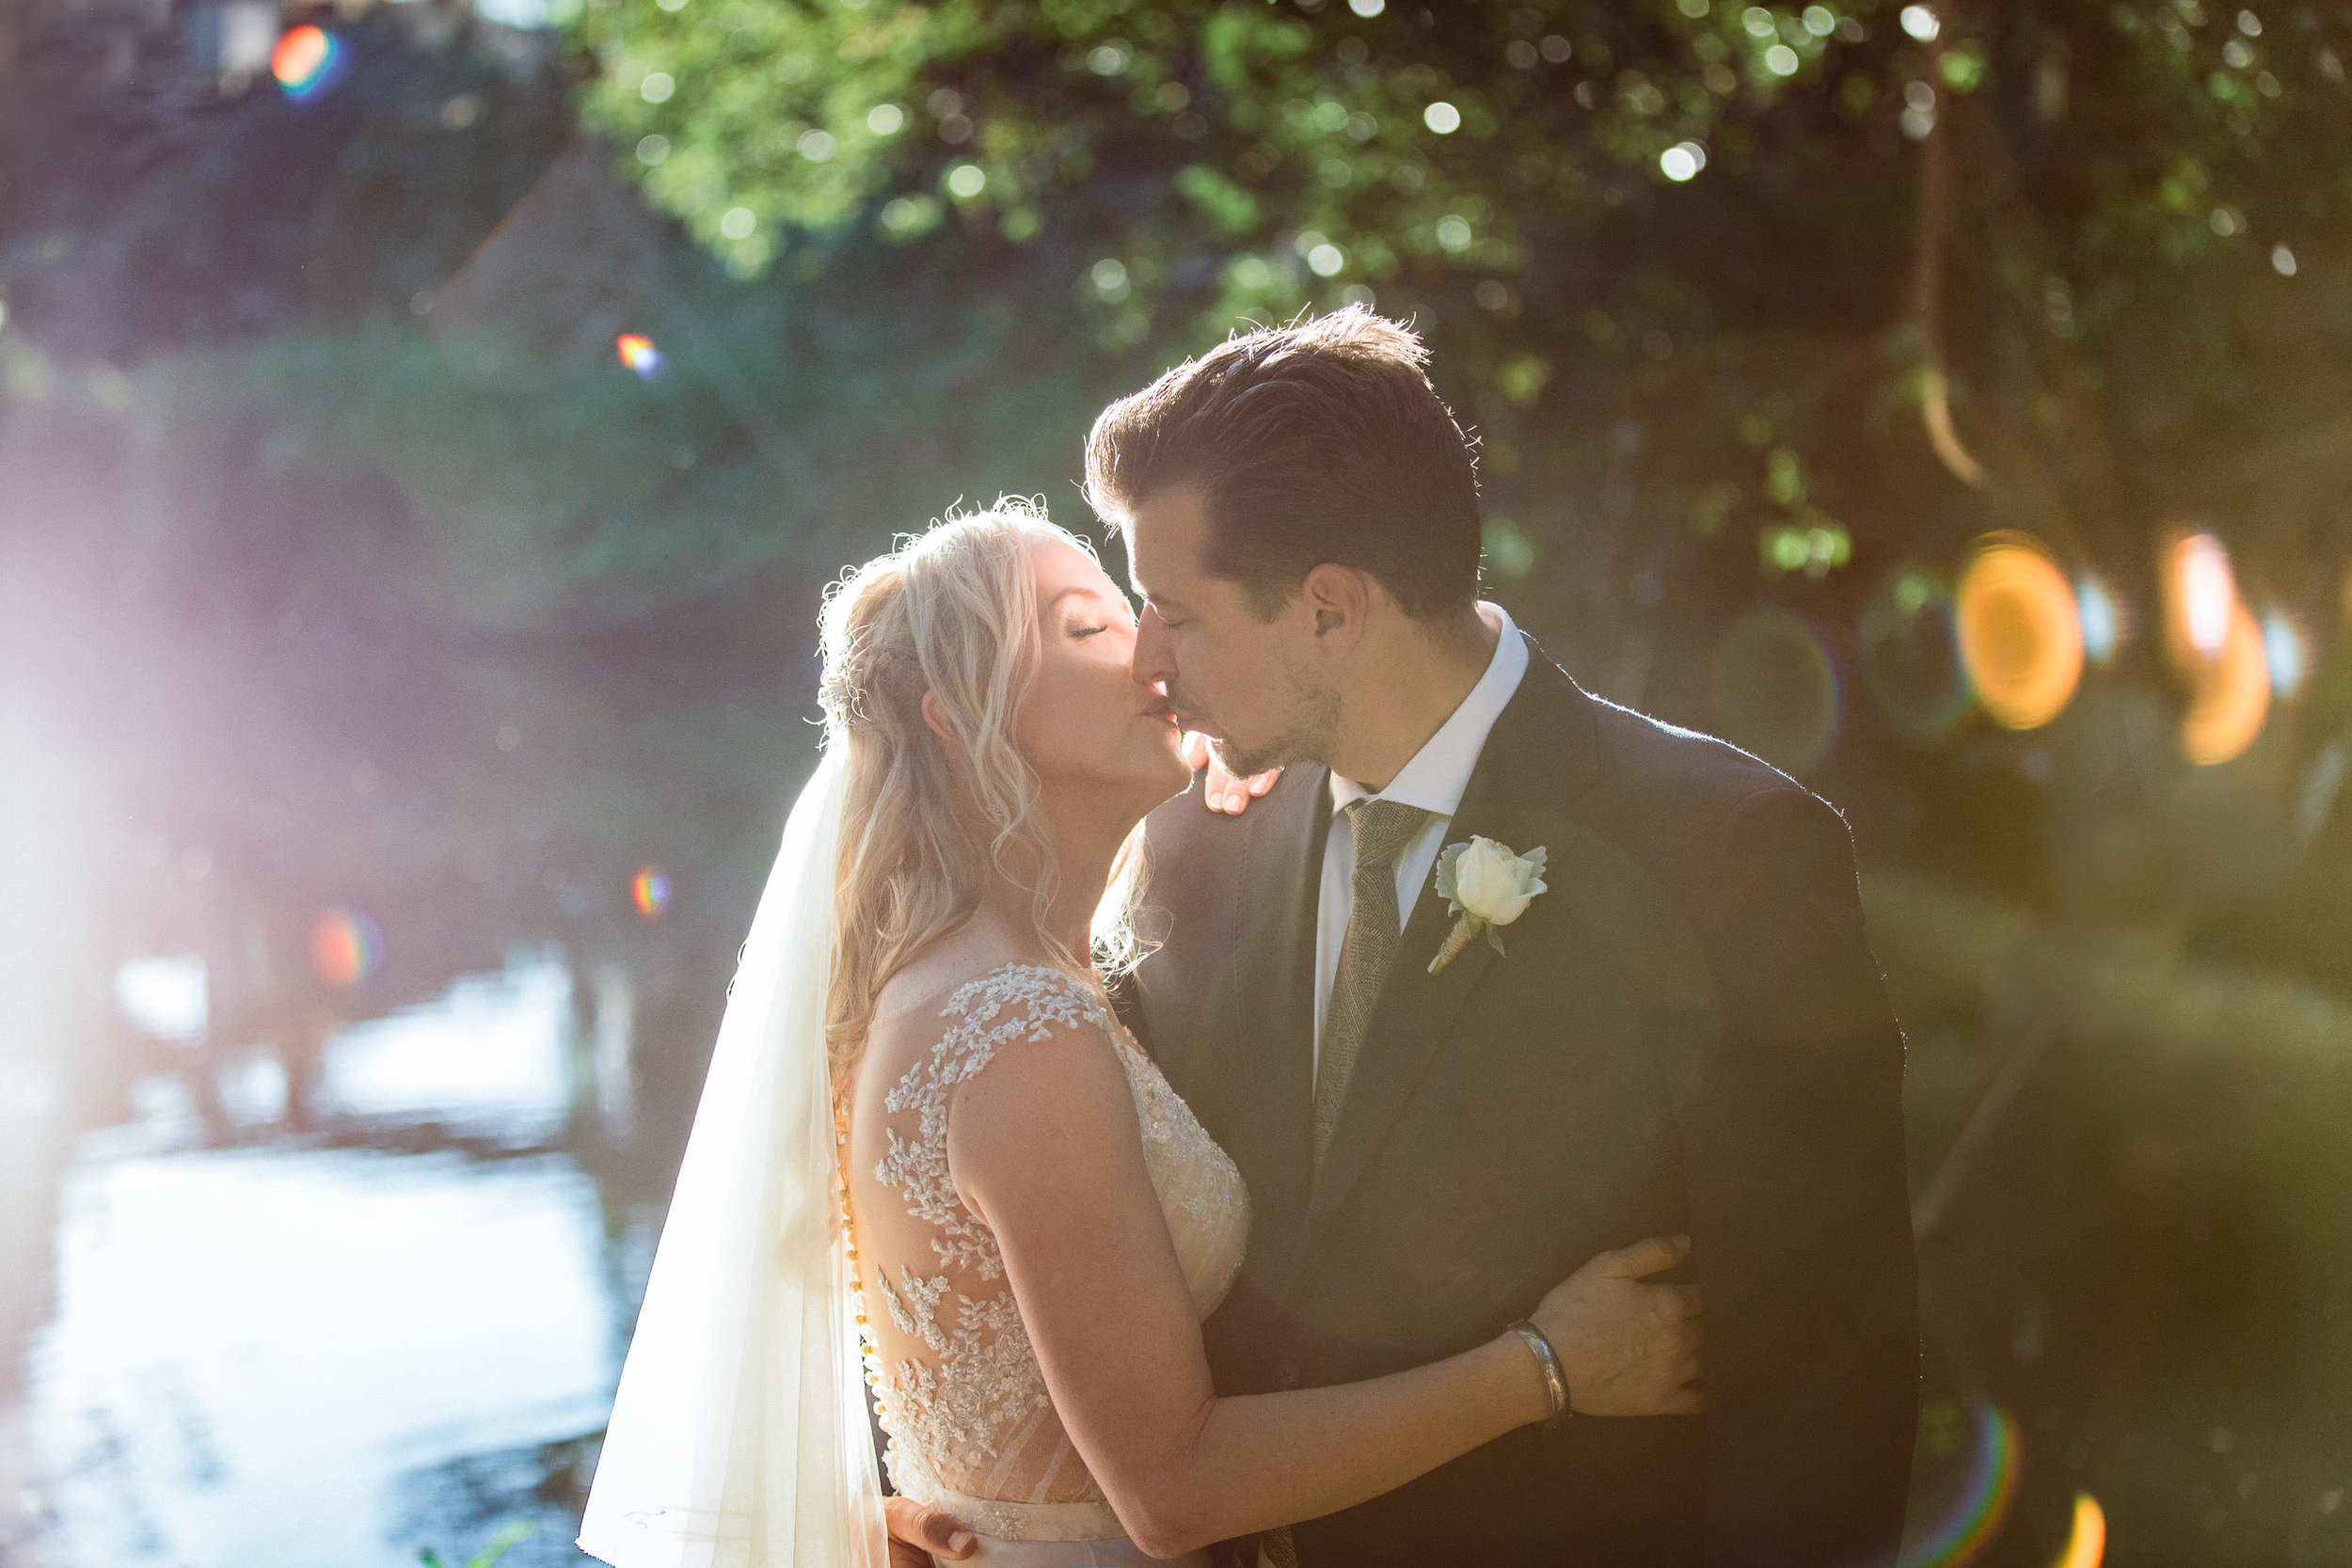 True North Photography_Boomerang Farm_Stacey and Isaac_Gold Coast Wedding_Barm Wedding_Hinterland Wedding-142.jpg